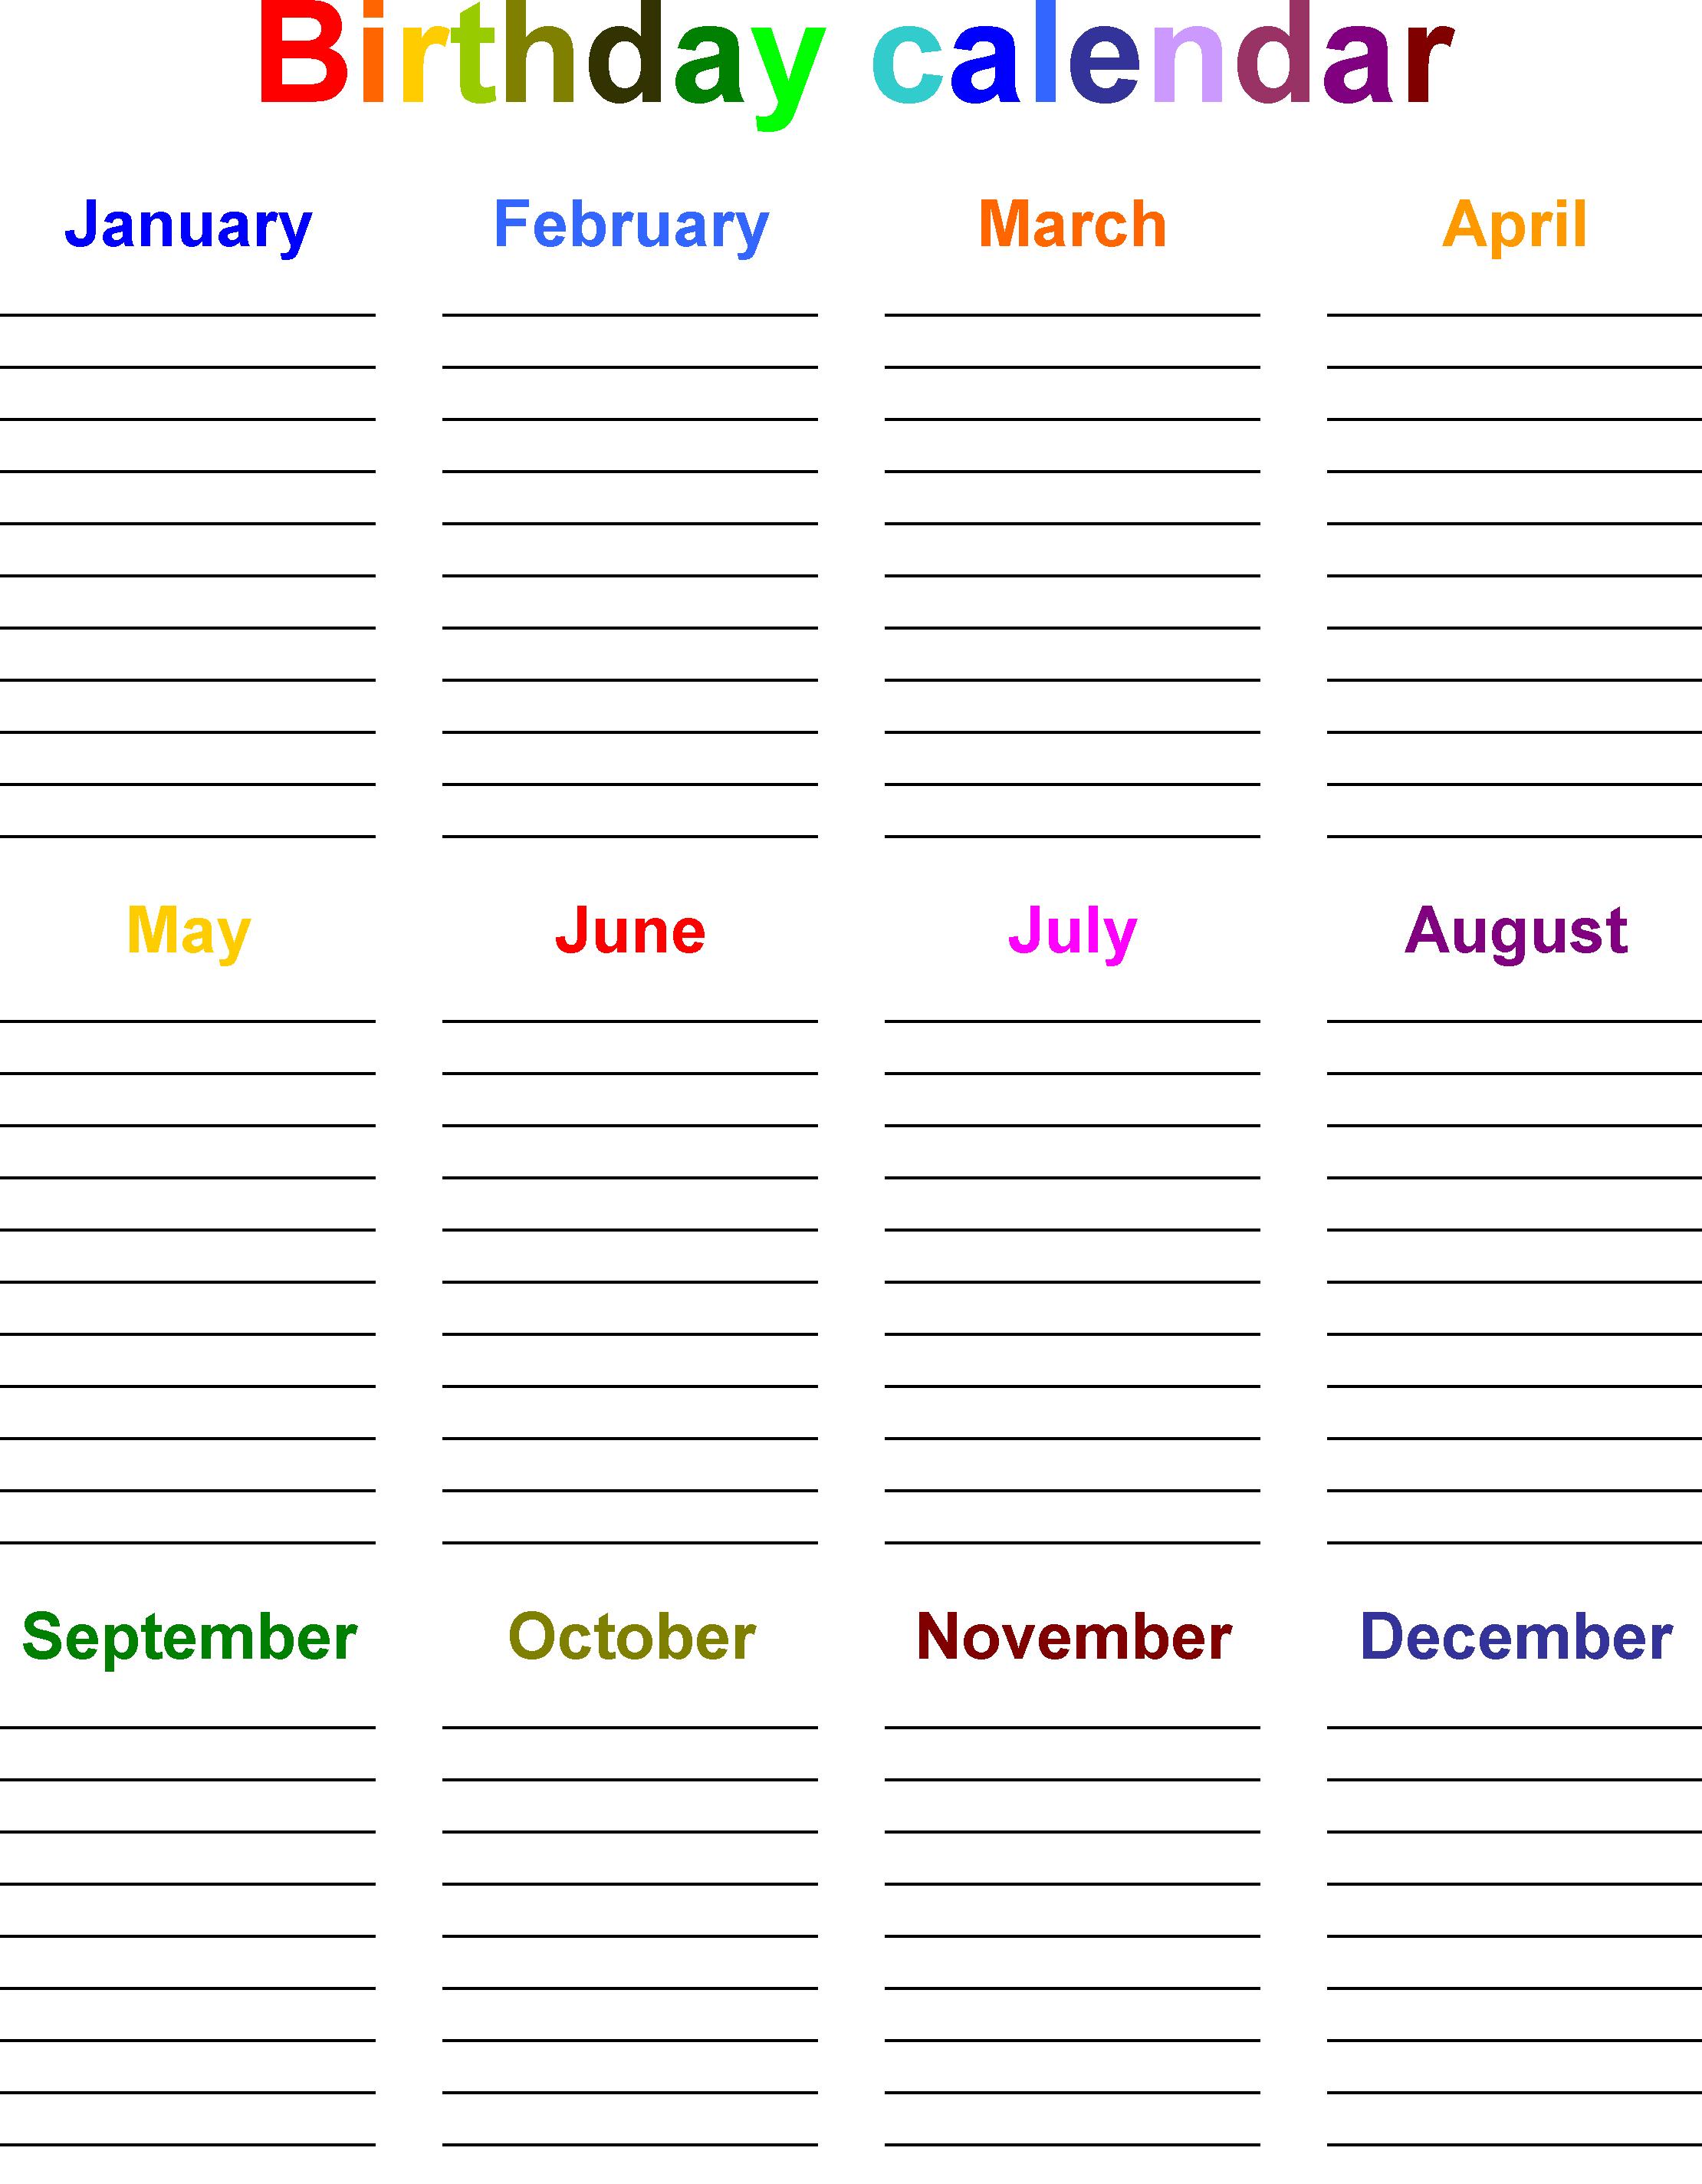 Birthday Calendar Template Birthday Calendar Template Pinterest